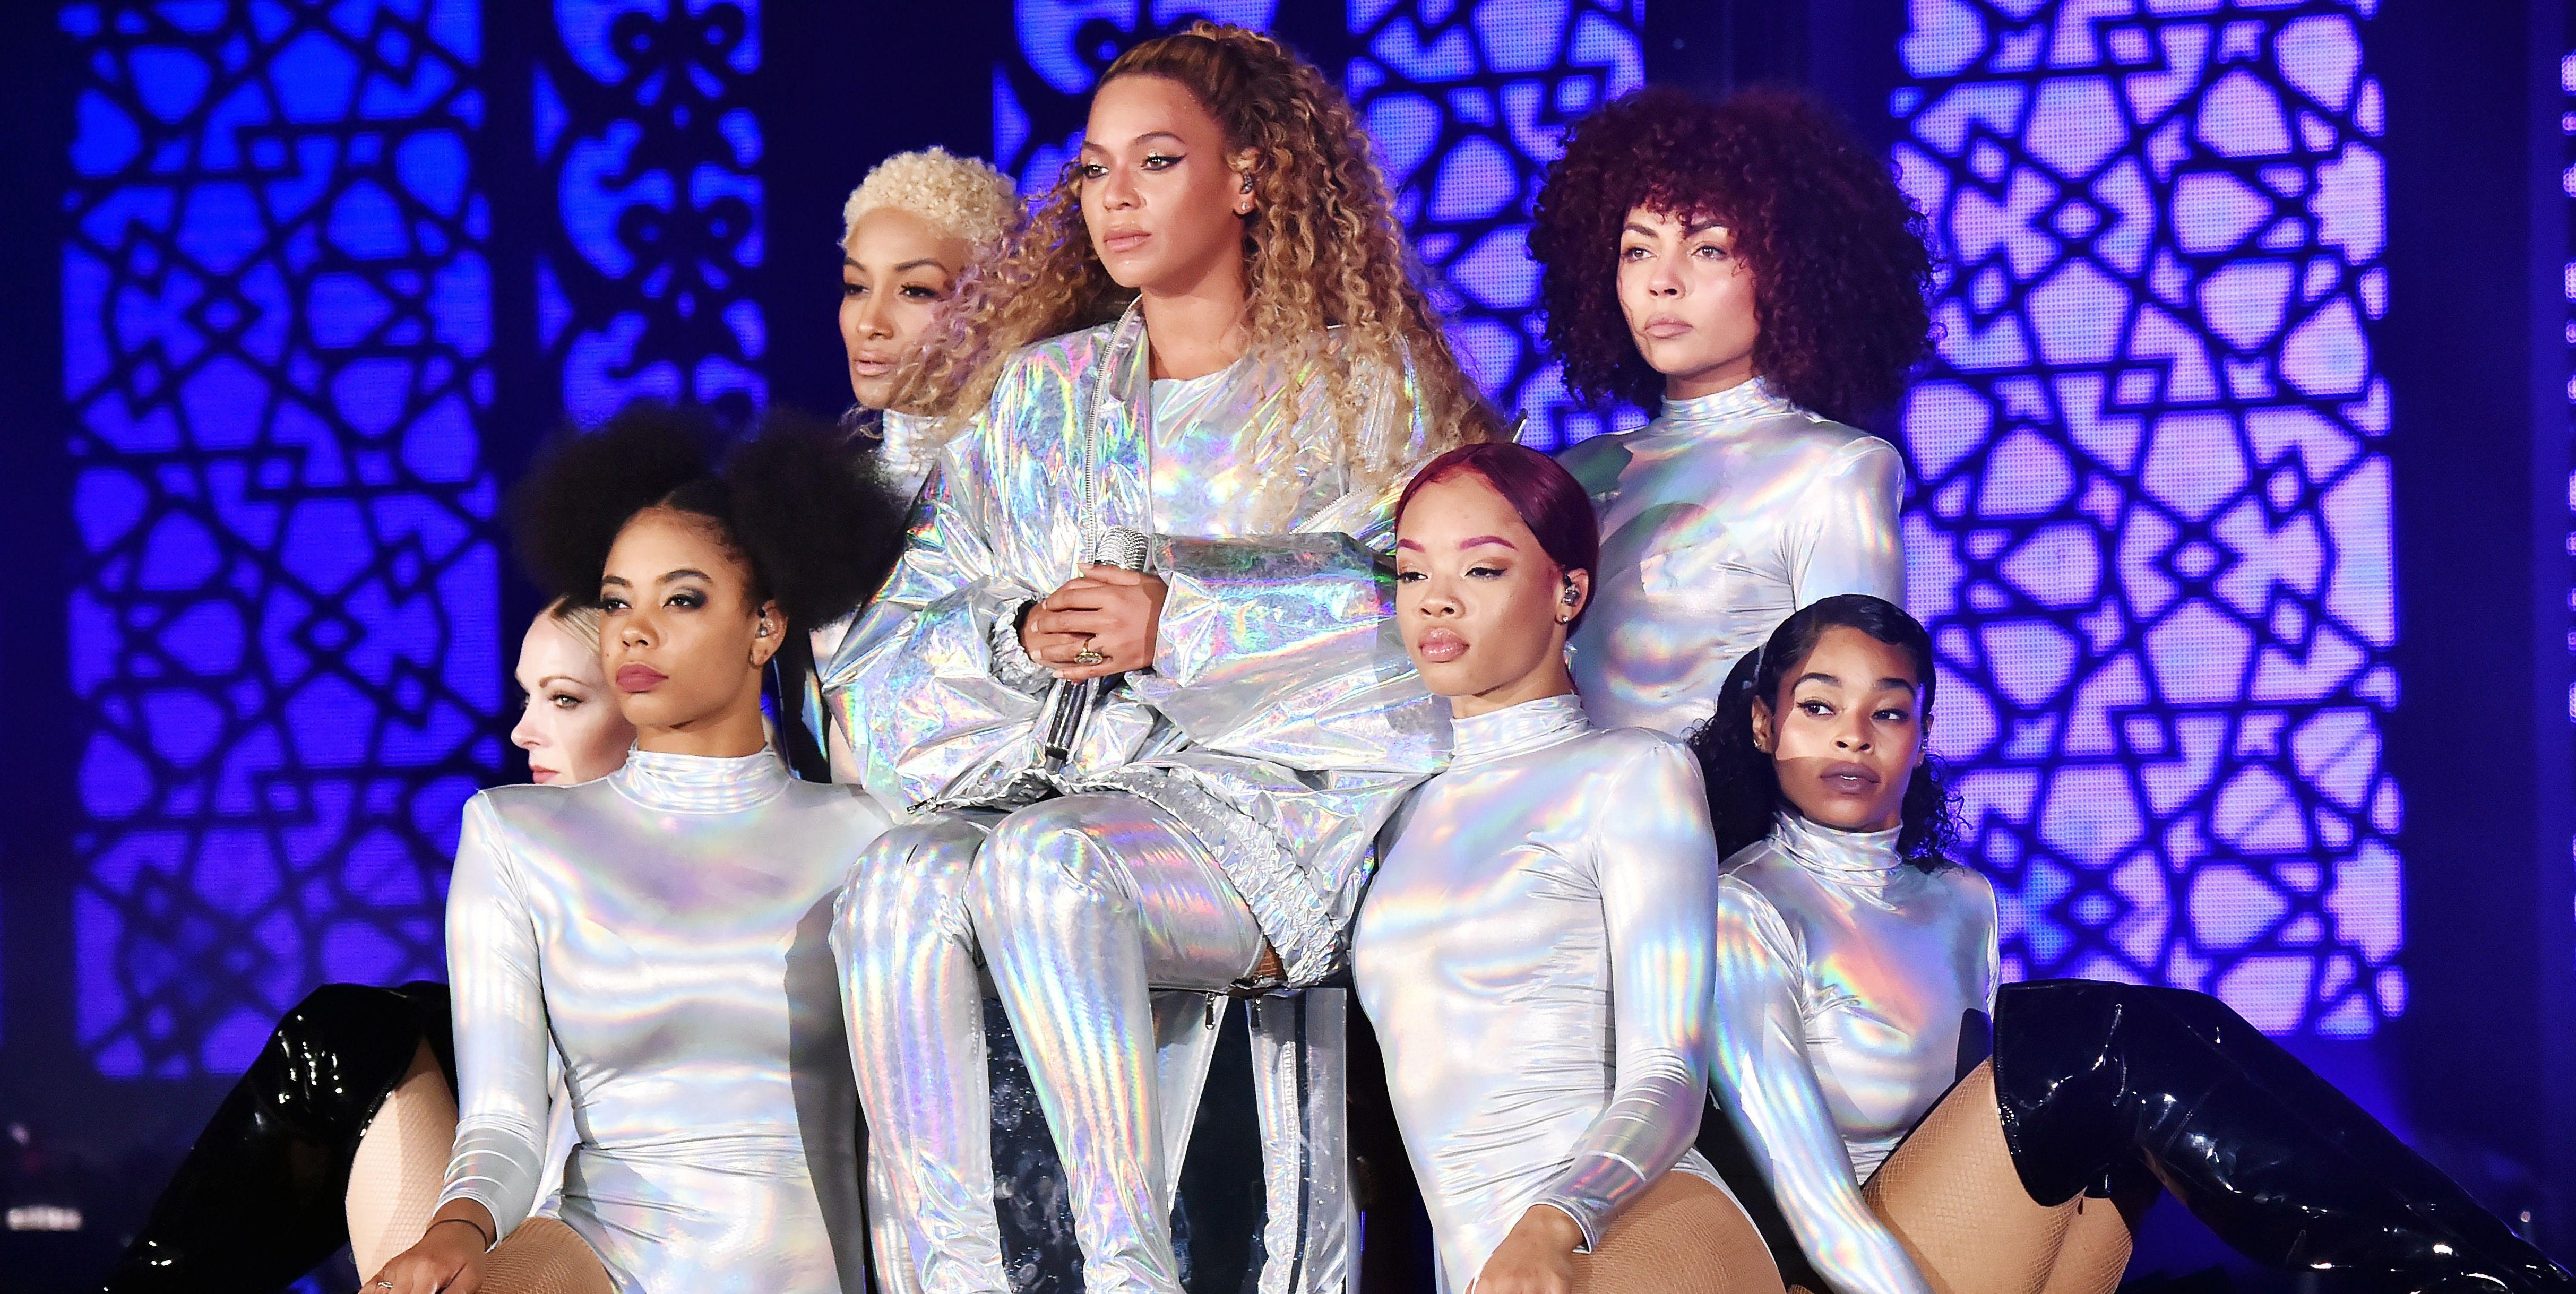 Beyoncé OTR tour II outfits